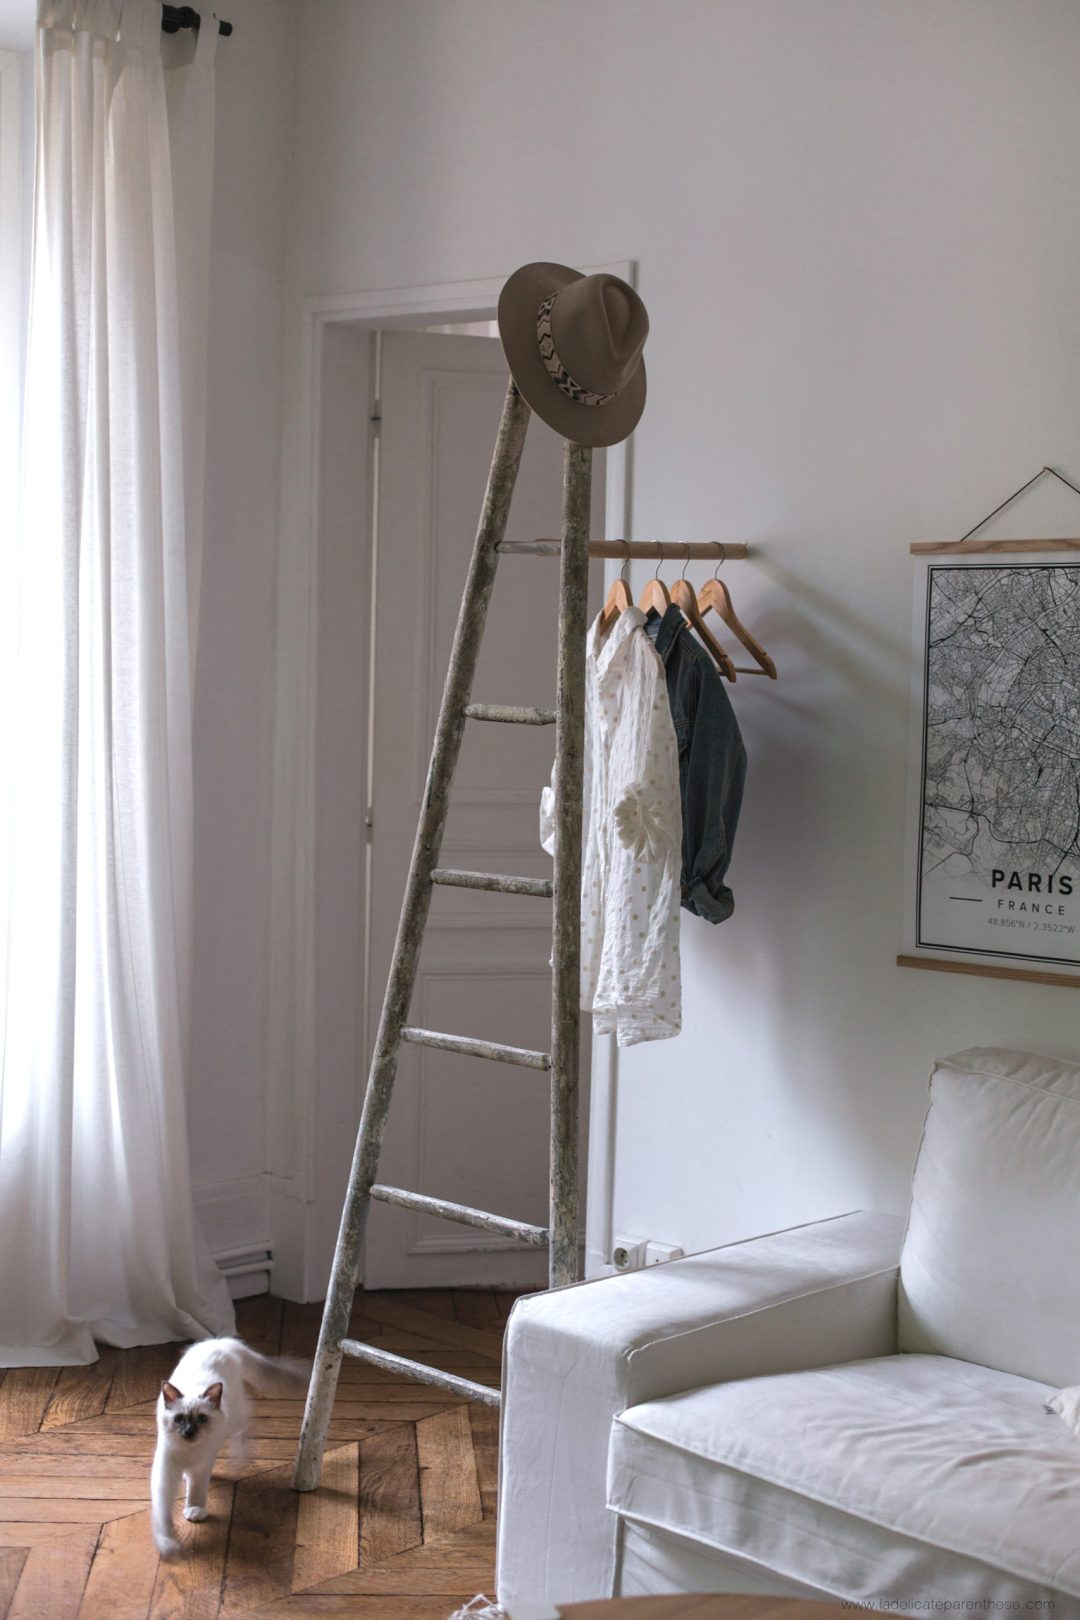 echelle portant DIY organizer